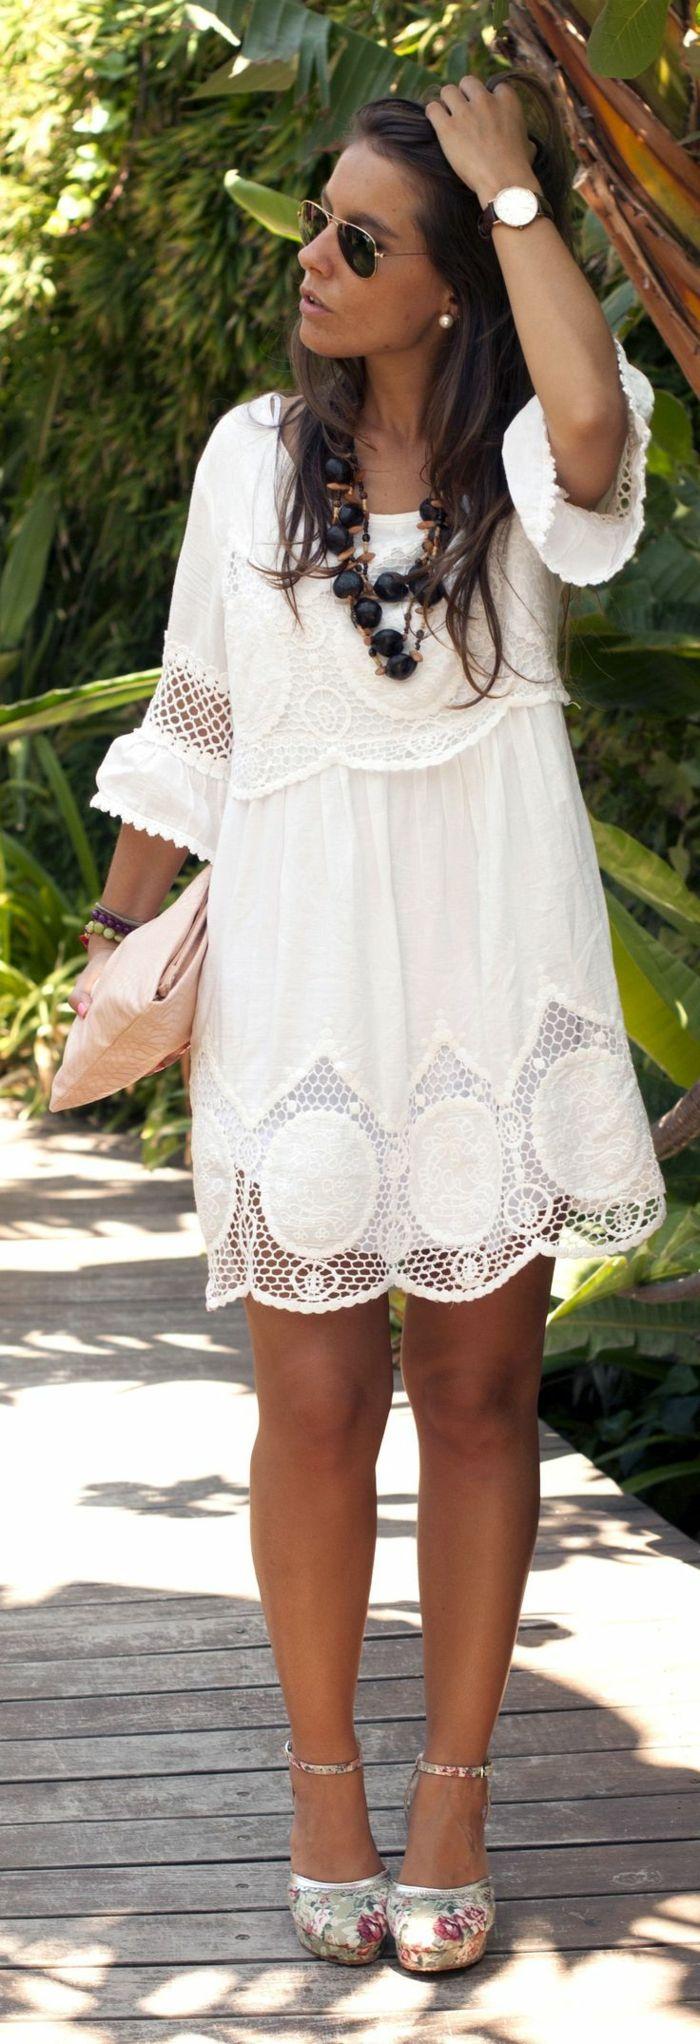 idées avec la robe blanche dentelle en tendance robe boho and